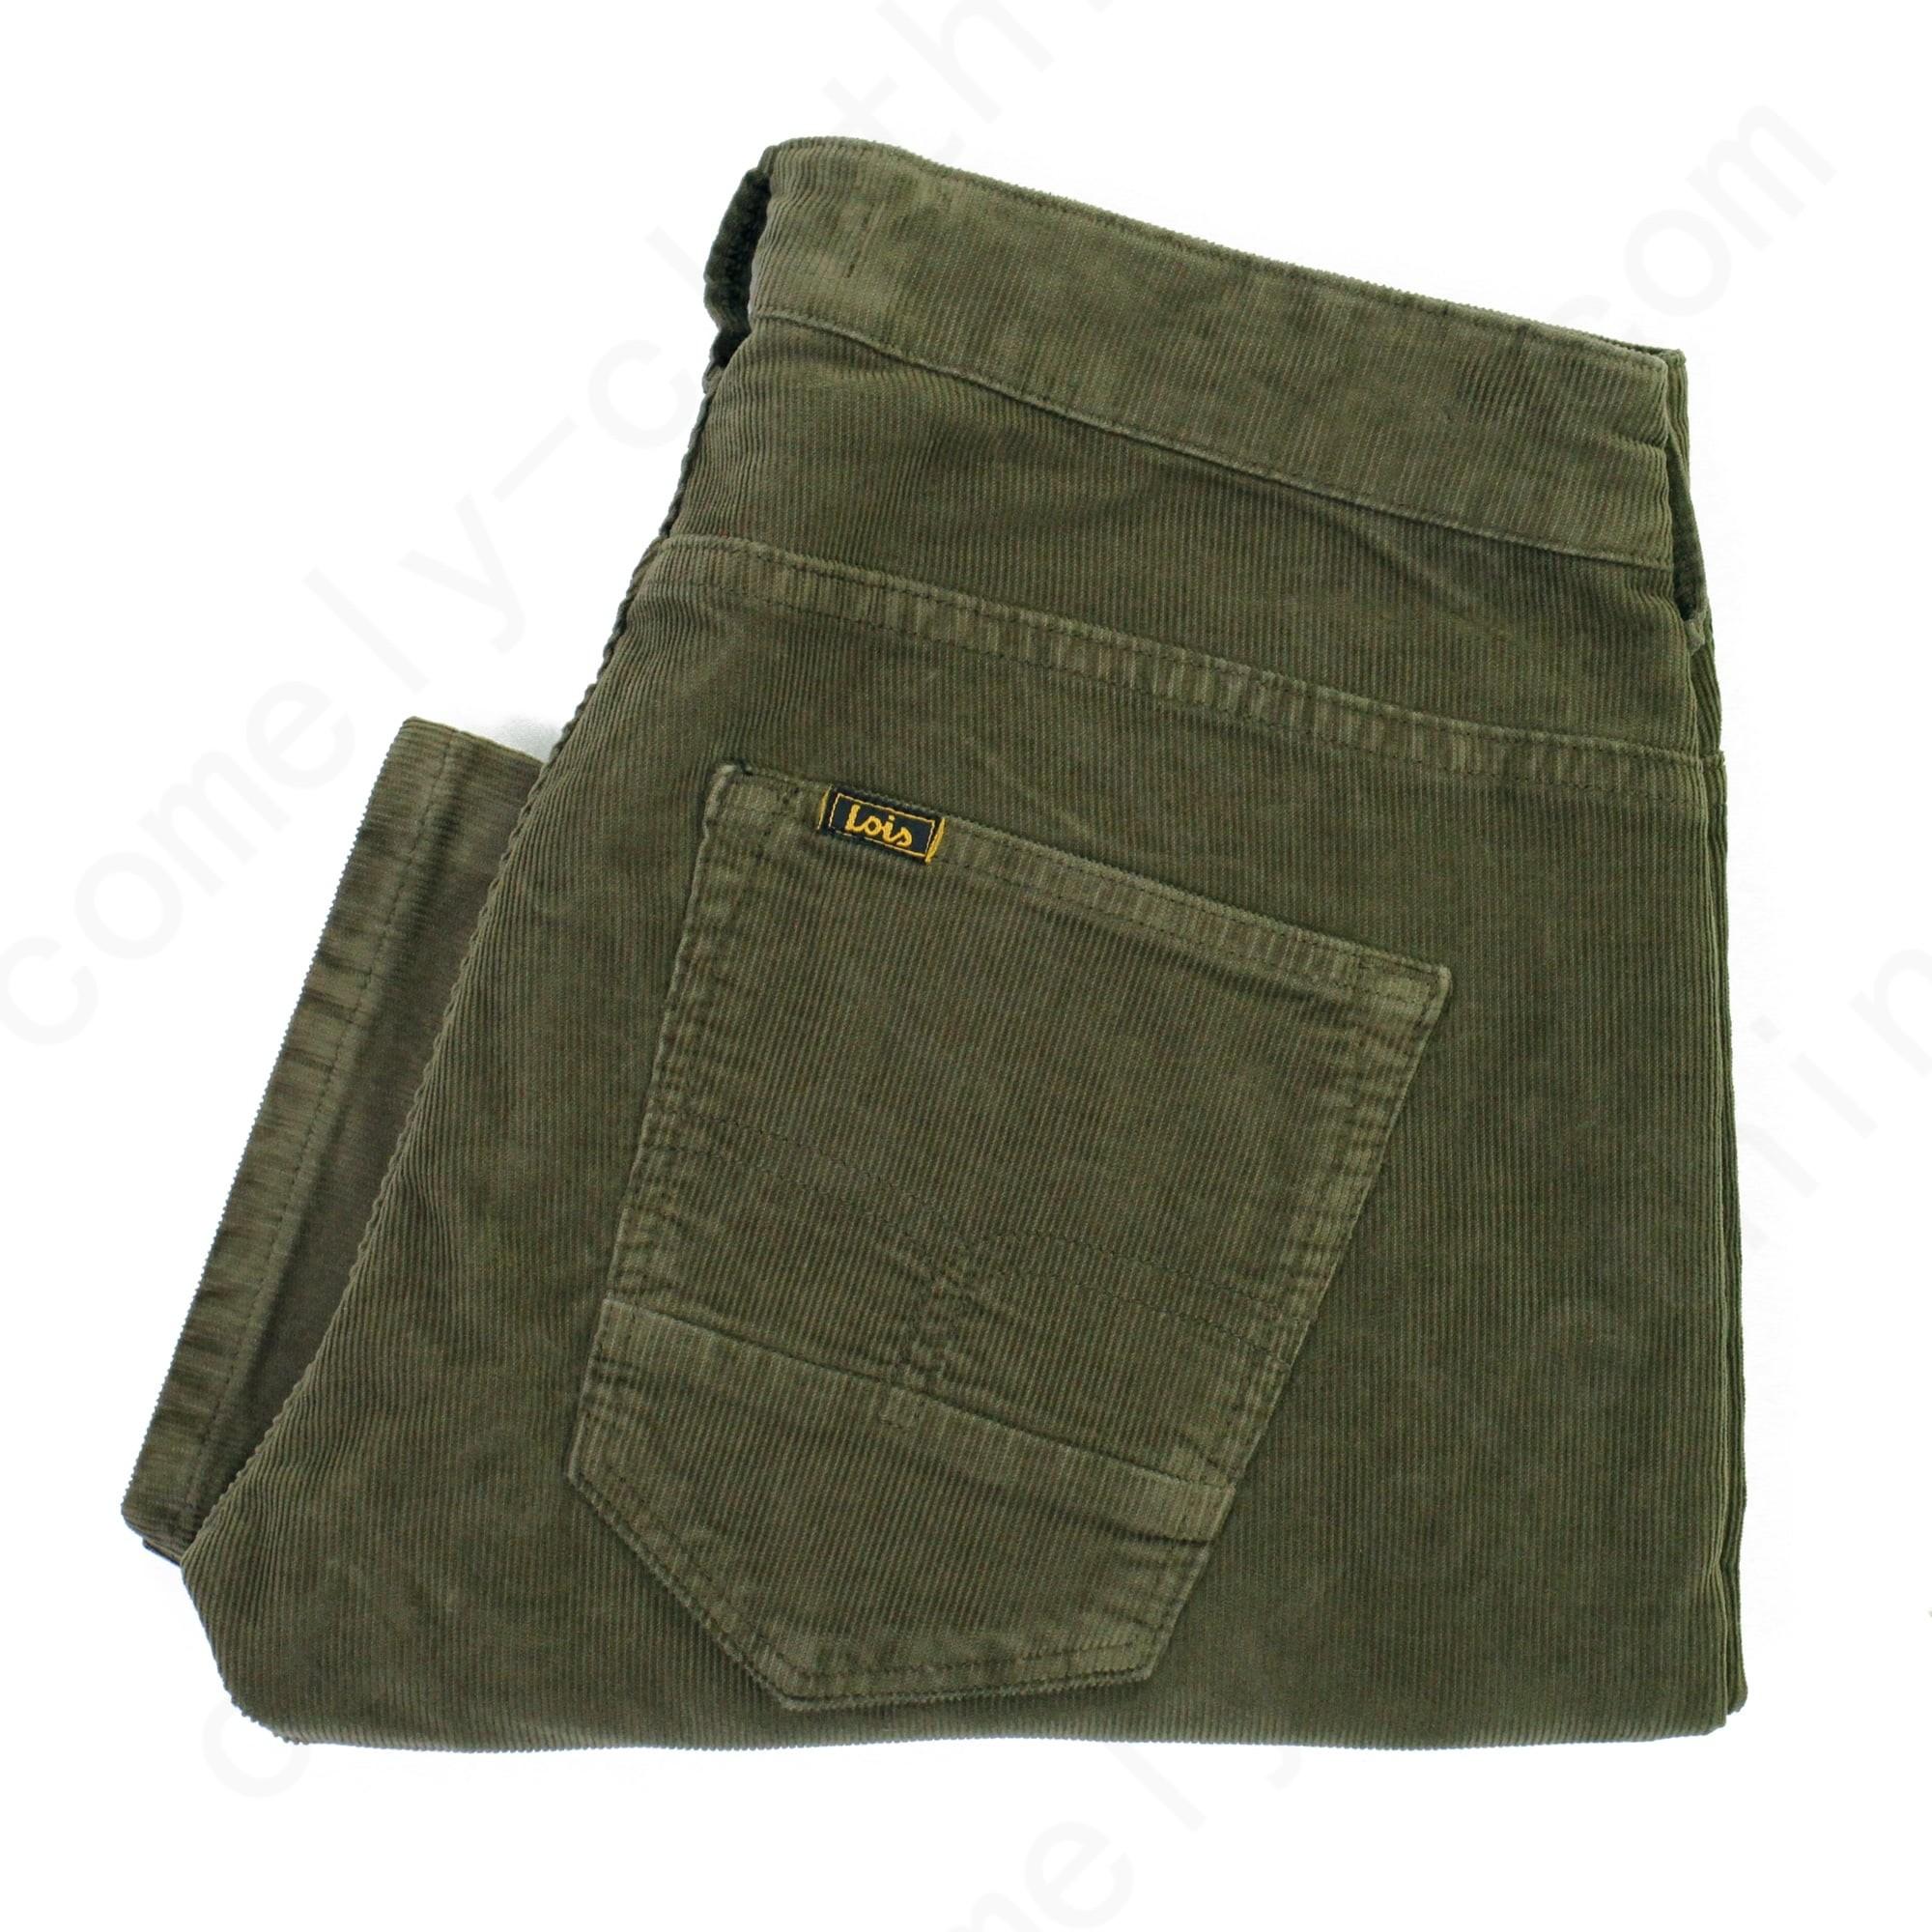 Lois Jeans Lois Sierra Thin Khaki Corduroy Trousers Mens - Lois Jeans Lois Sierra Thin Khaki Corduroy Trousers Mens